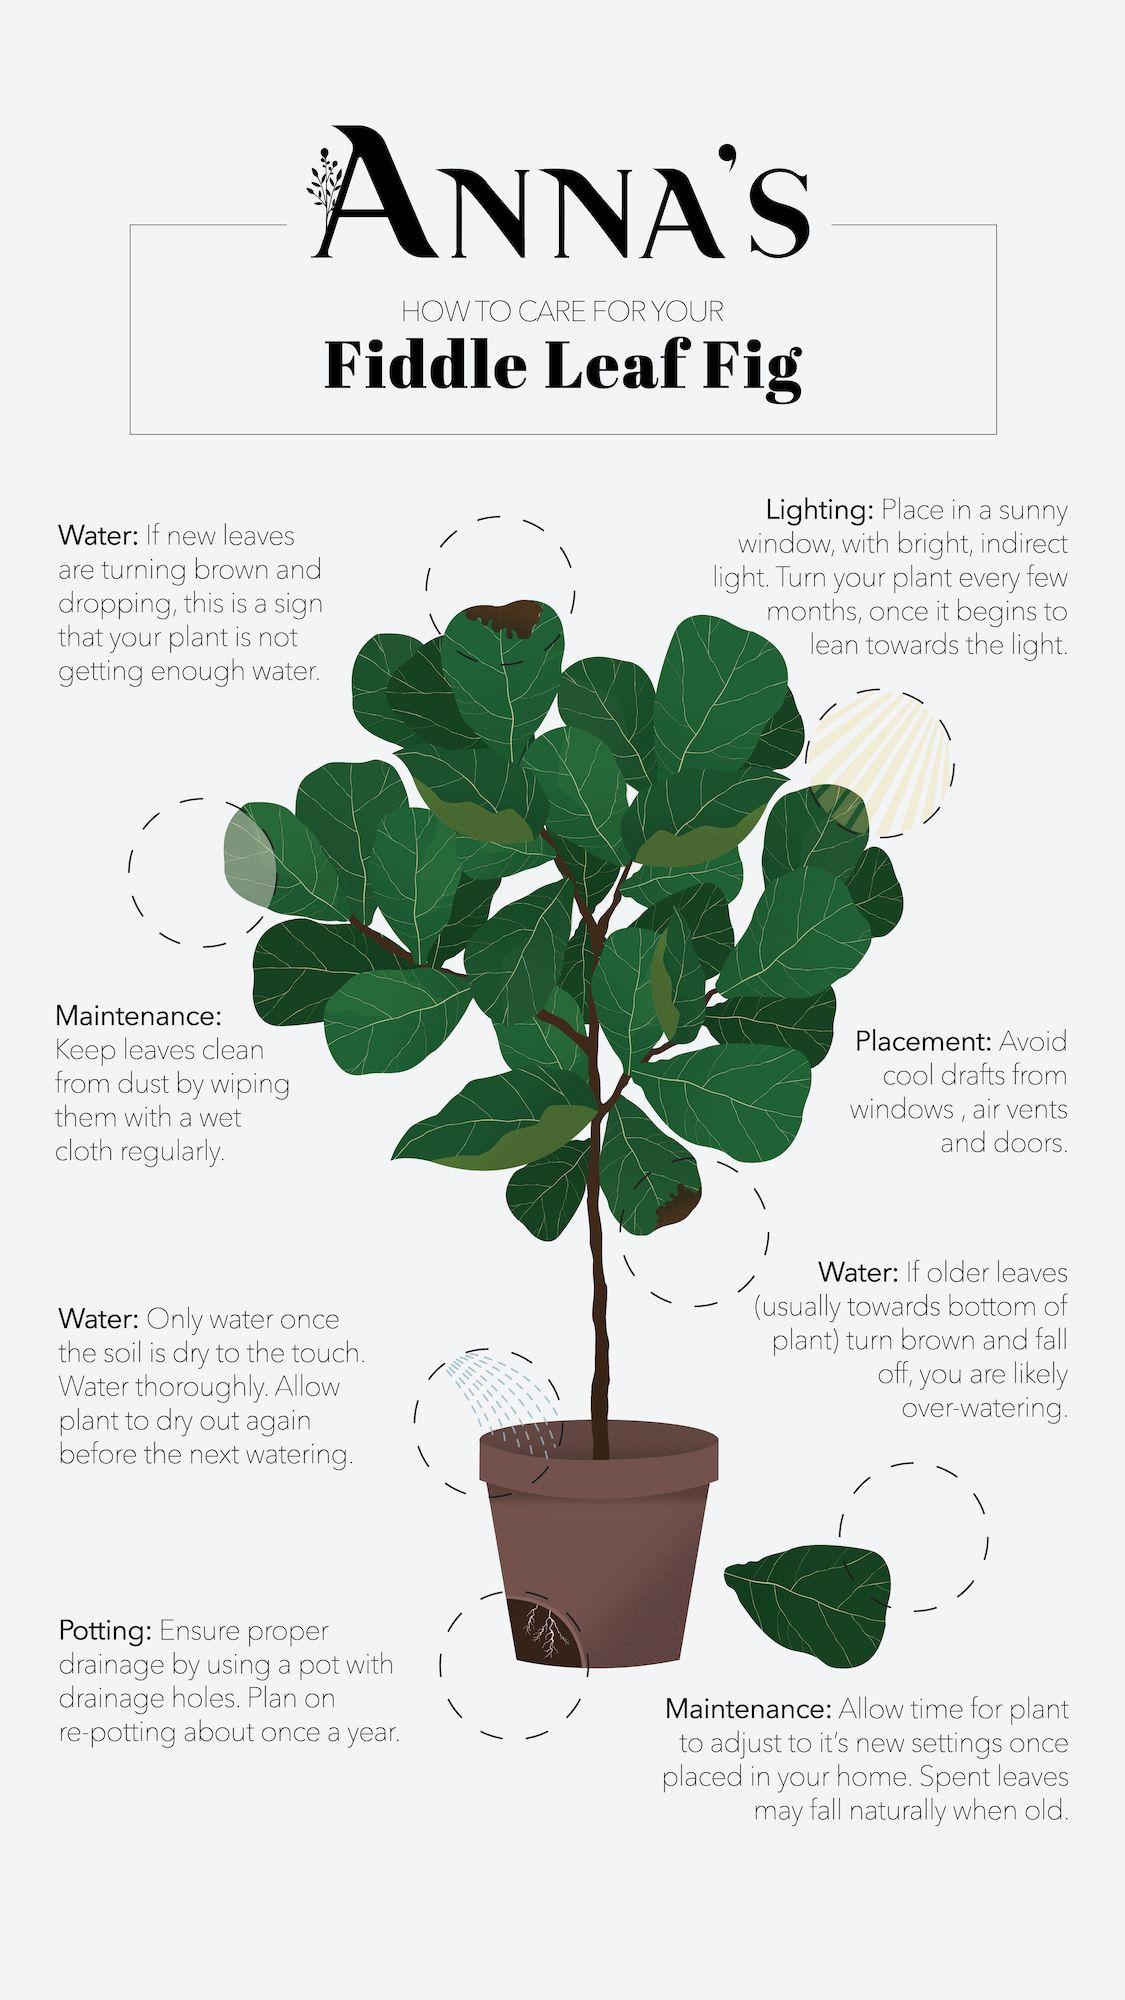 Extraordinaire  Mot-Clé Featuring Fiddle Leaf Fig The Instagram Trending Houseplant   Anna's   Garden, Home & Wellness